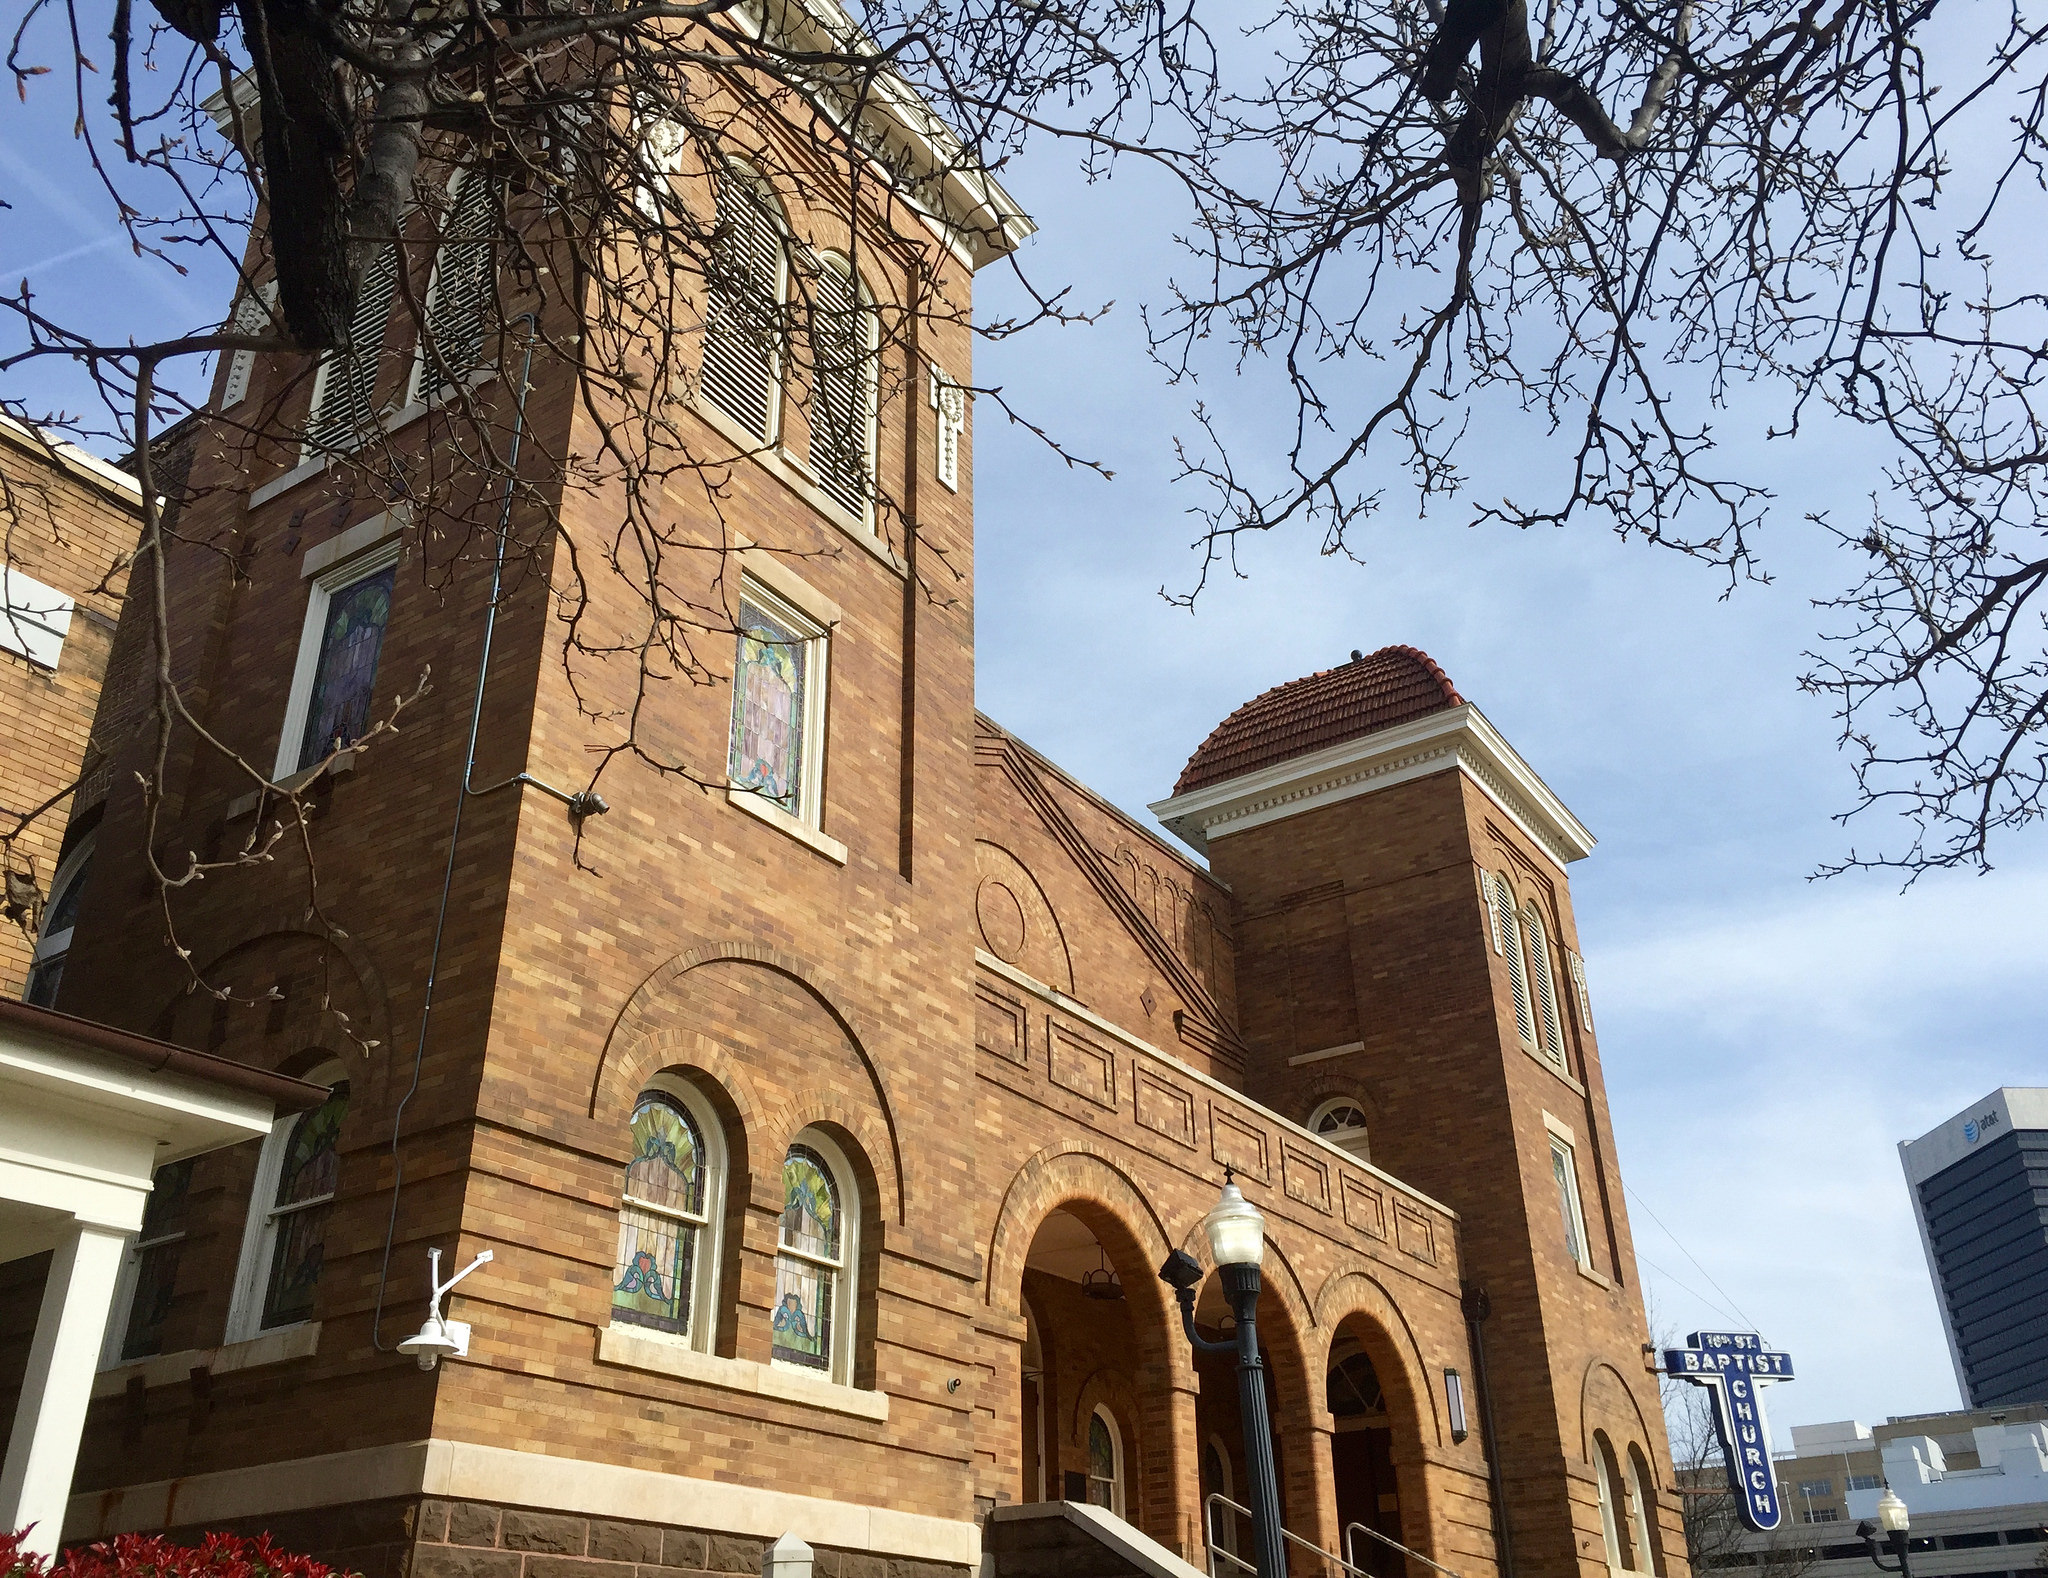 16th Street Baptist, Birmingham, Alabama